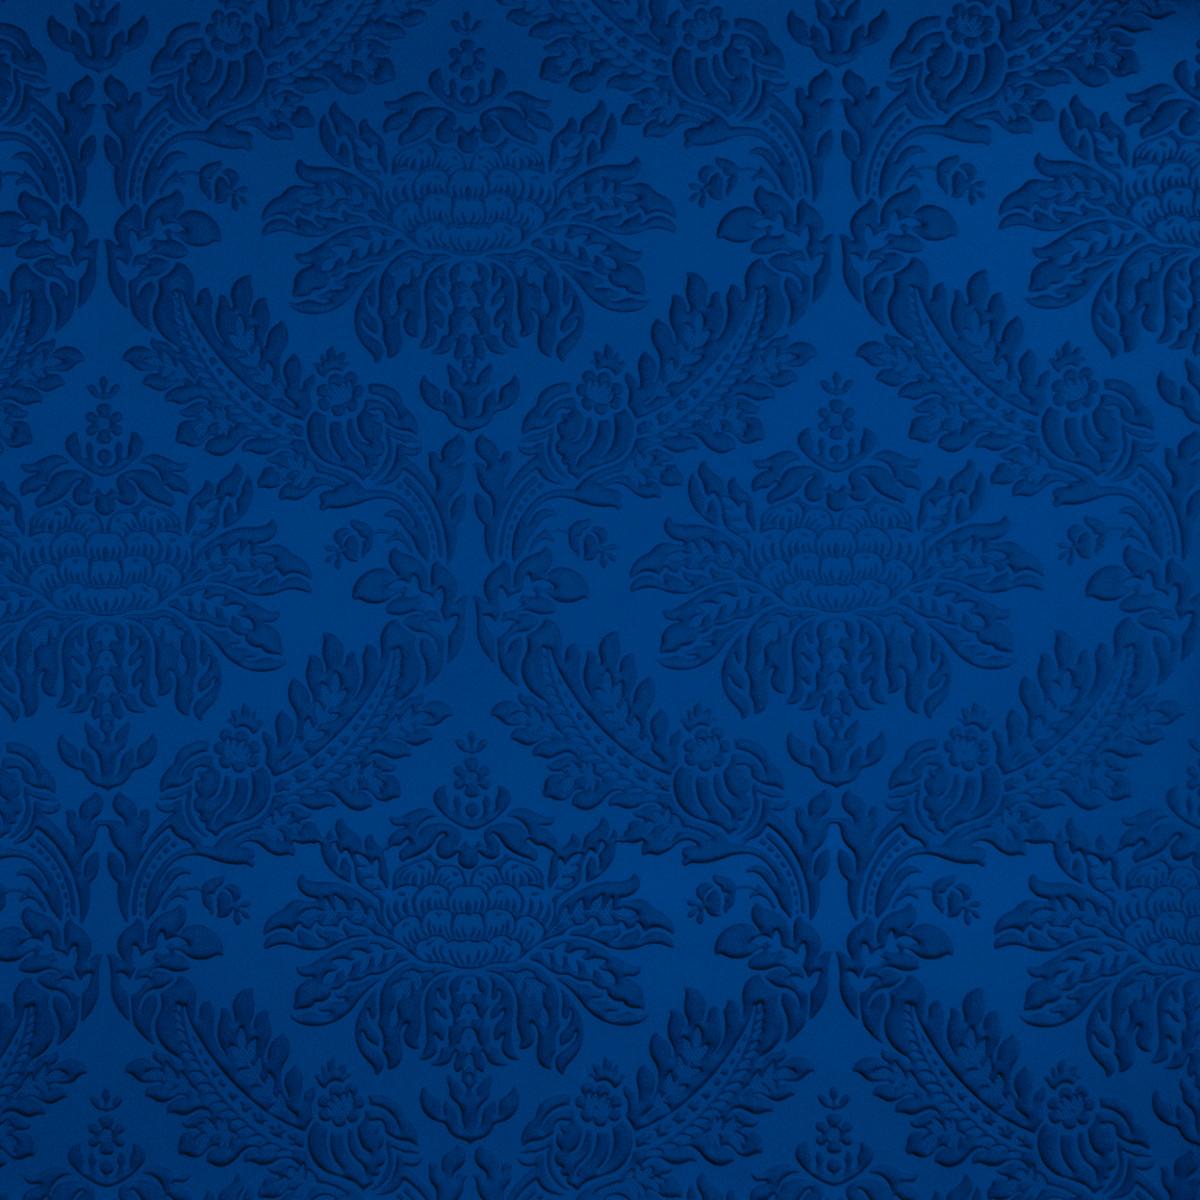 hochwertige tapeten und stoffe exklusive 3d textil. Black Bedroom Furniture Sets. Home Design Ideas